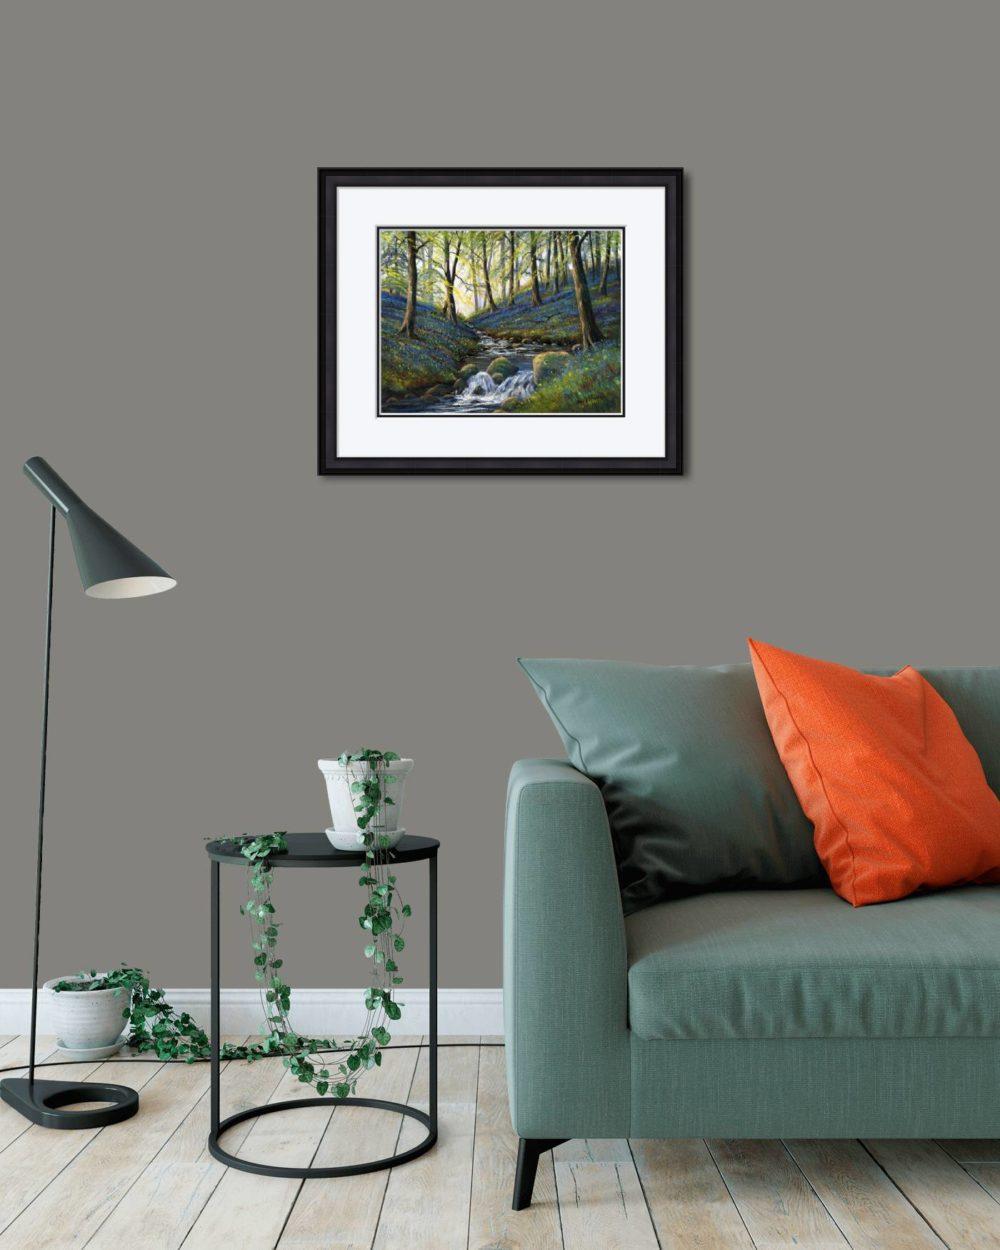 Bluebells Slatequarry Print (Medium) in Black Frame in Room